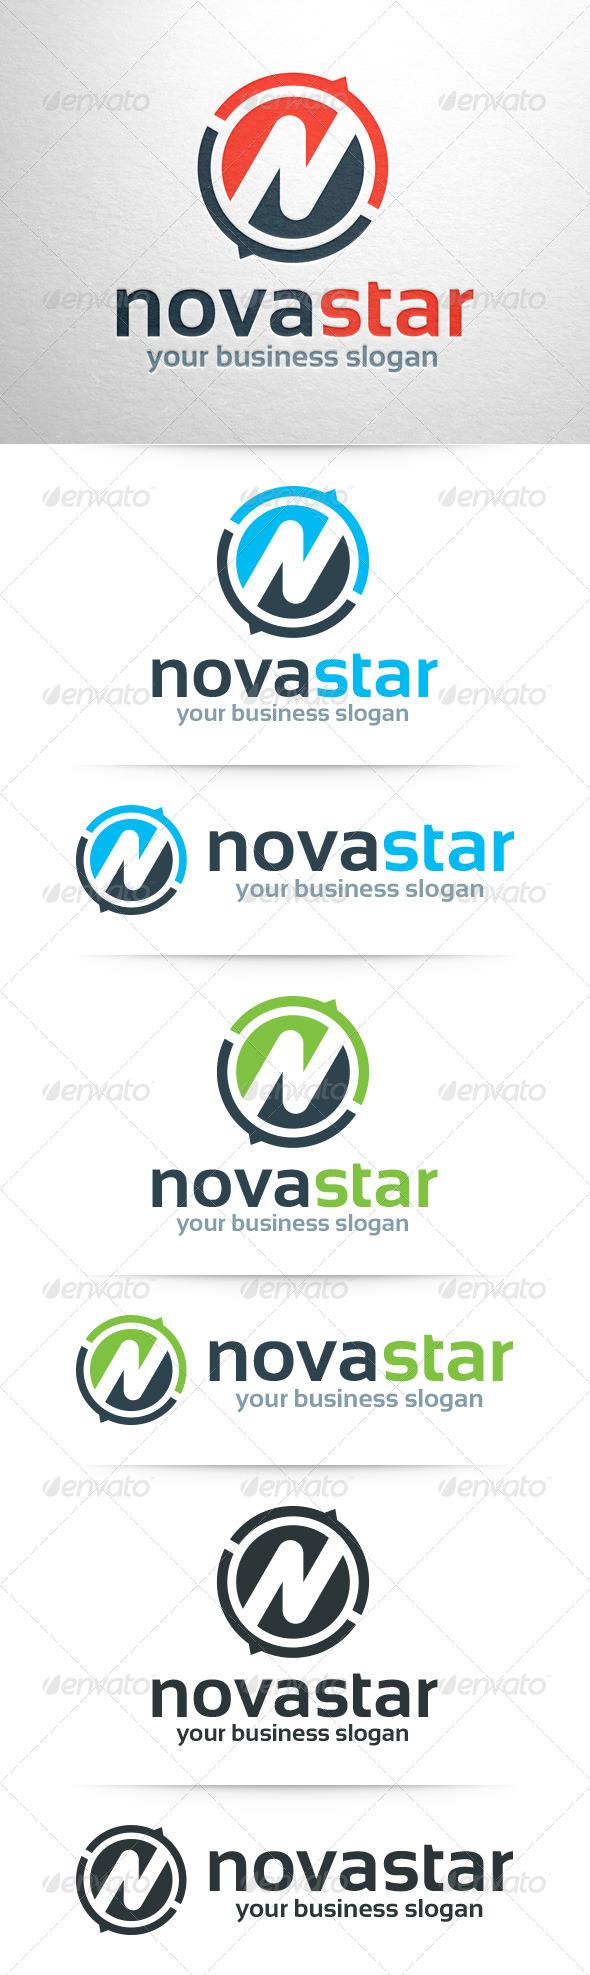 GraphicRiver Novastar Letter N Logo 8046009